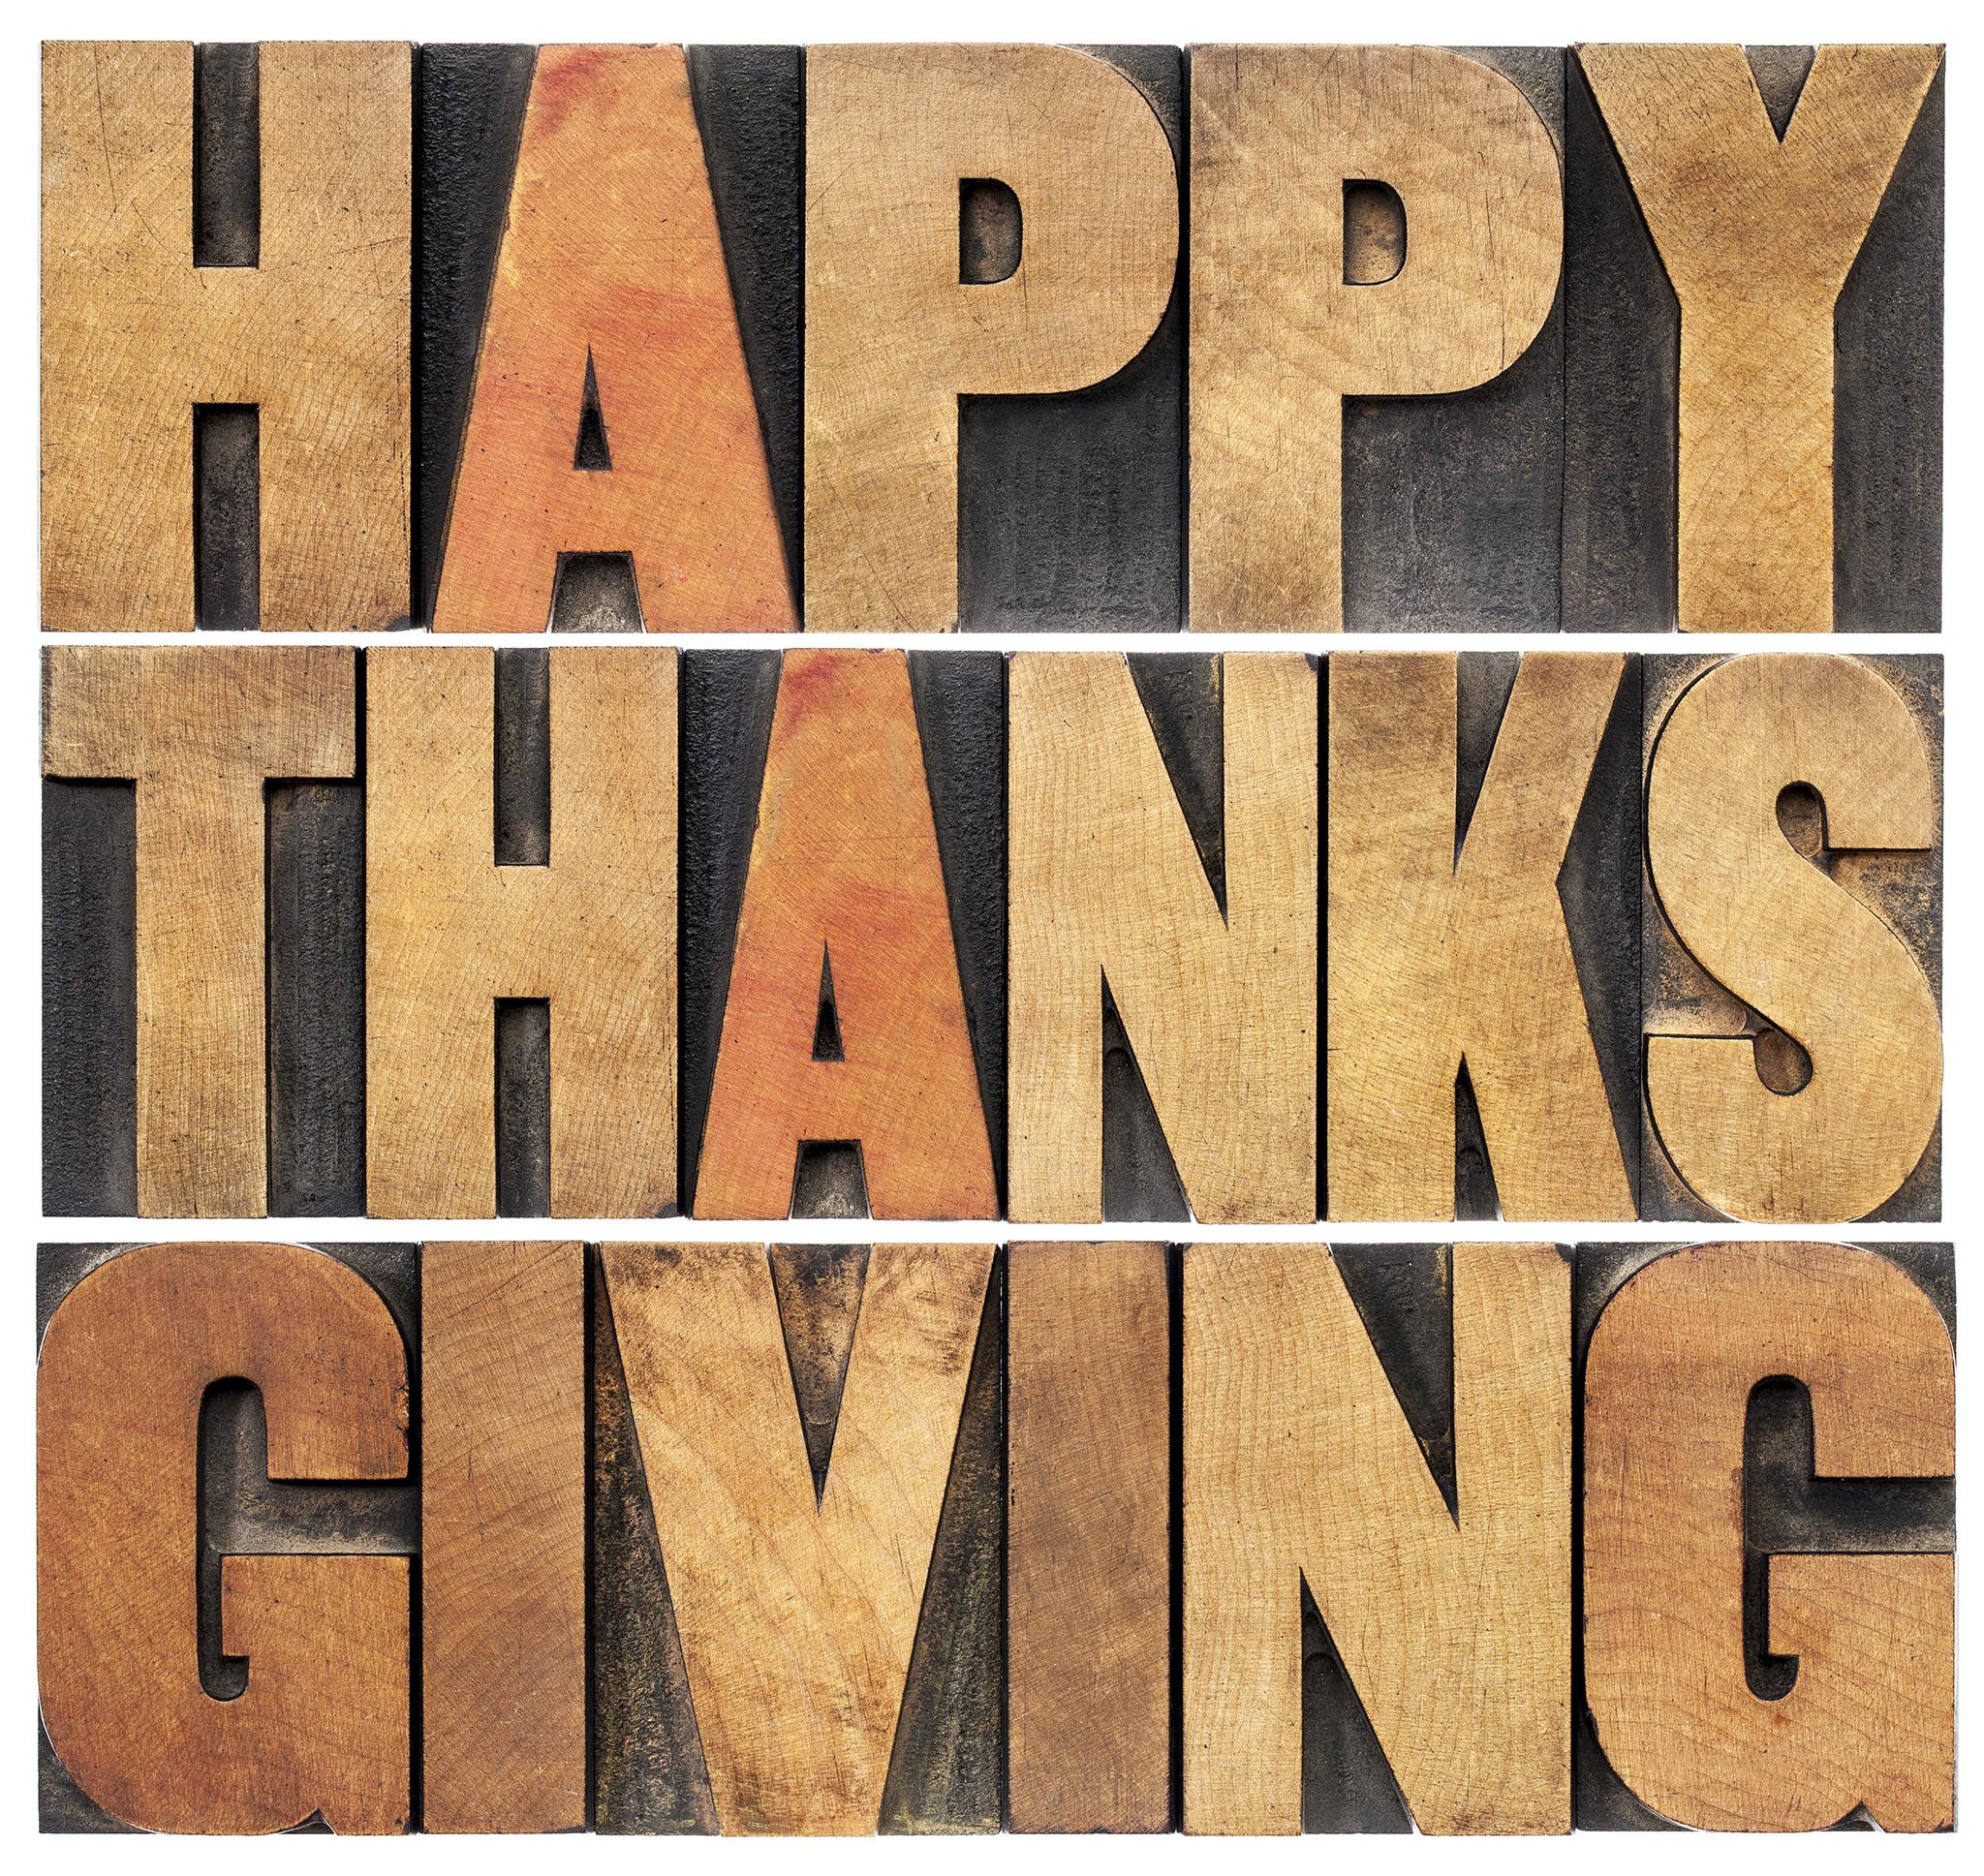 thanksgiving_wood_block.jpg